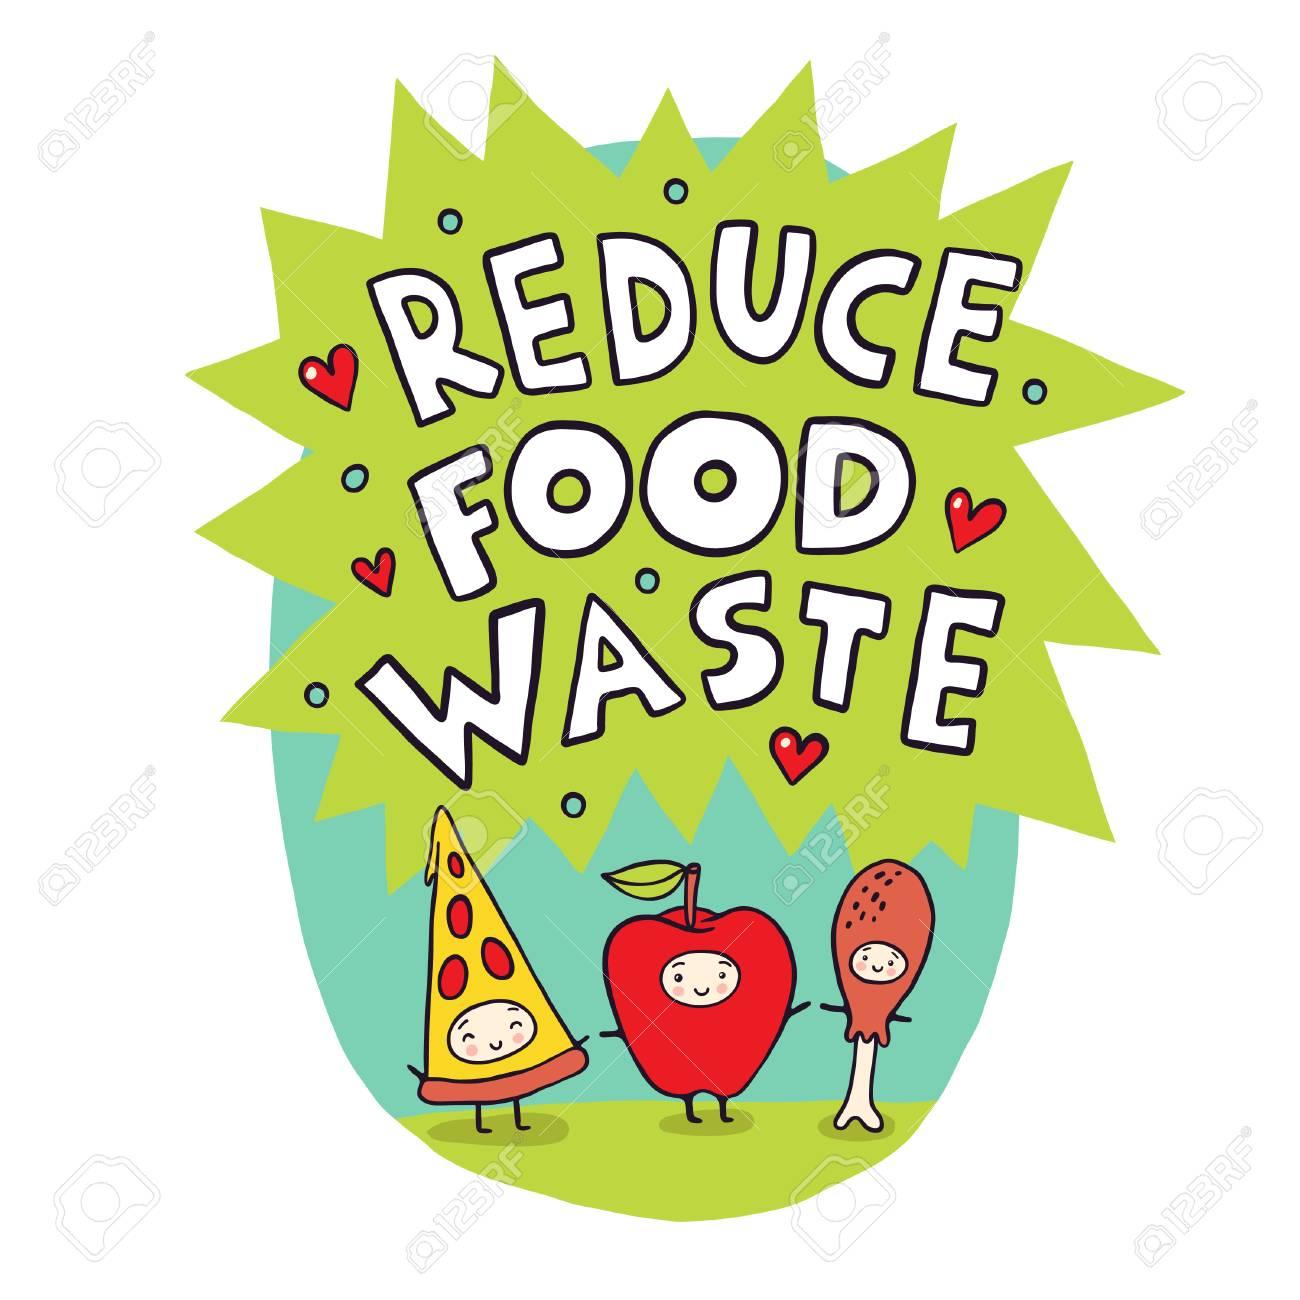 110277651-reduce-food-waste-cartoon-vector-illustration.jpg